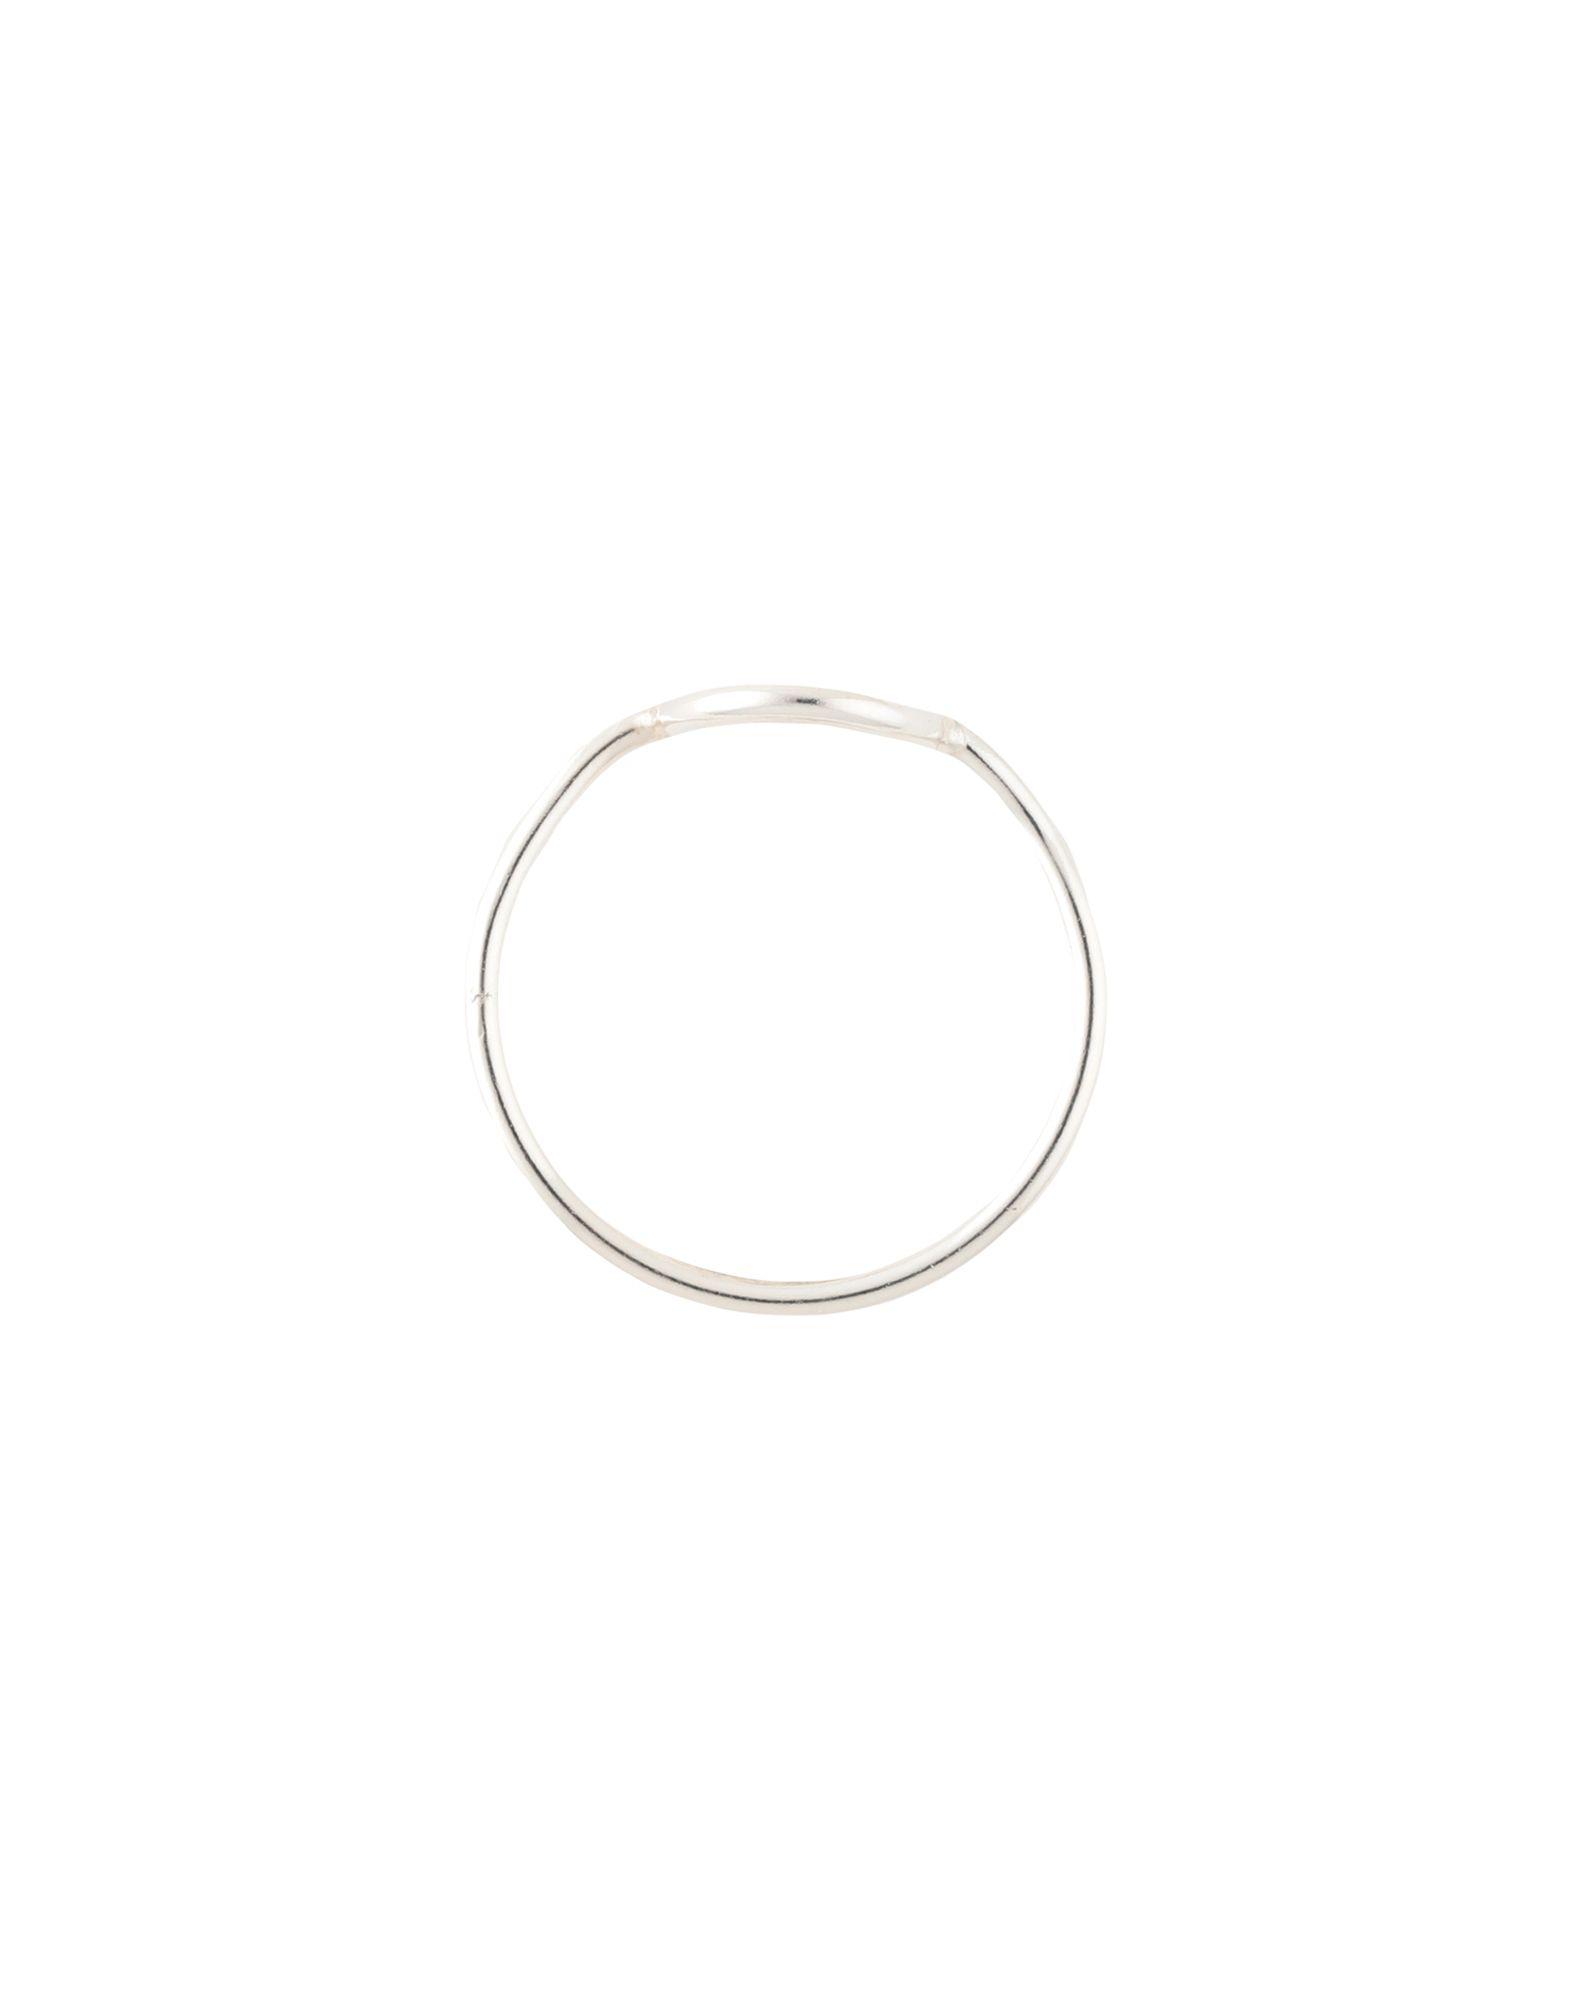 KARA YOO レディース 指輪 Celina Ring シルバー